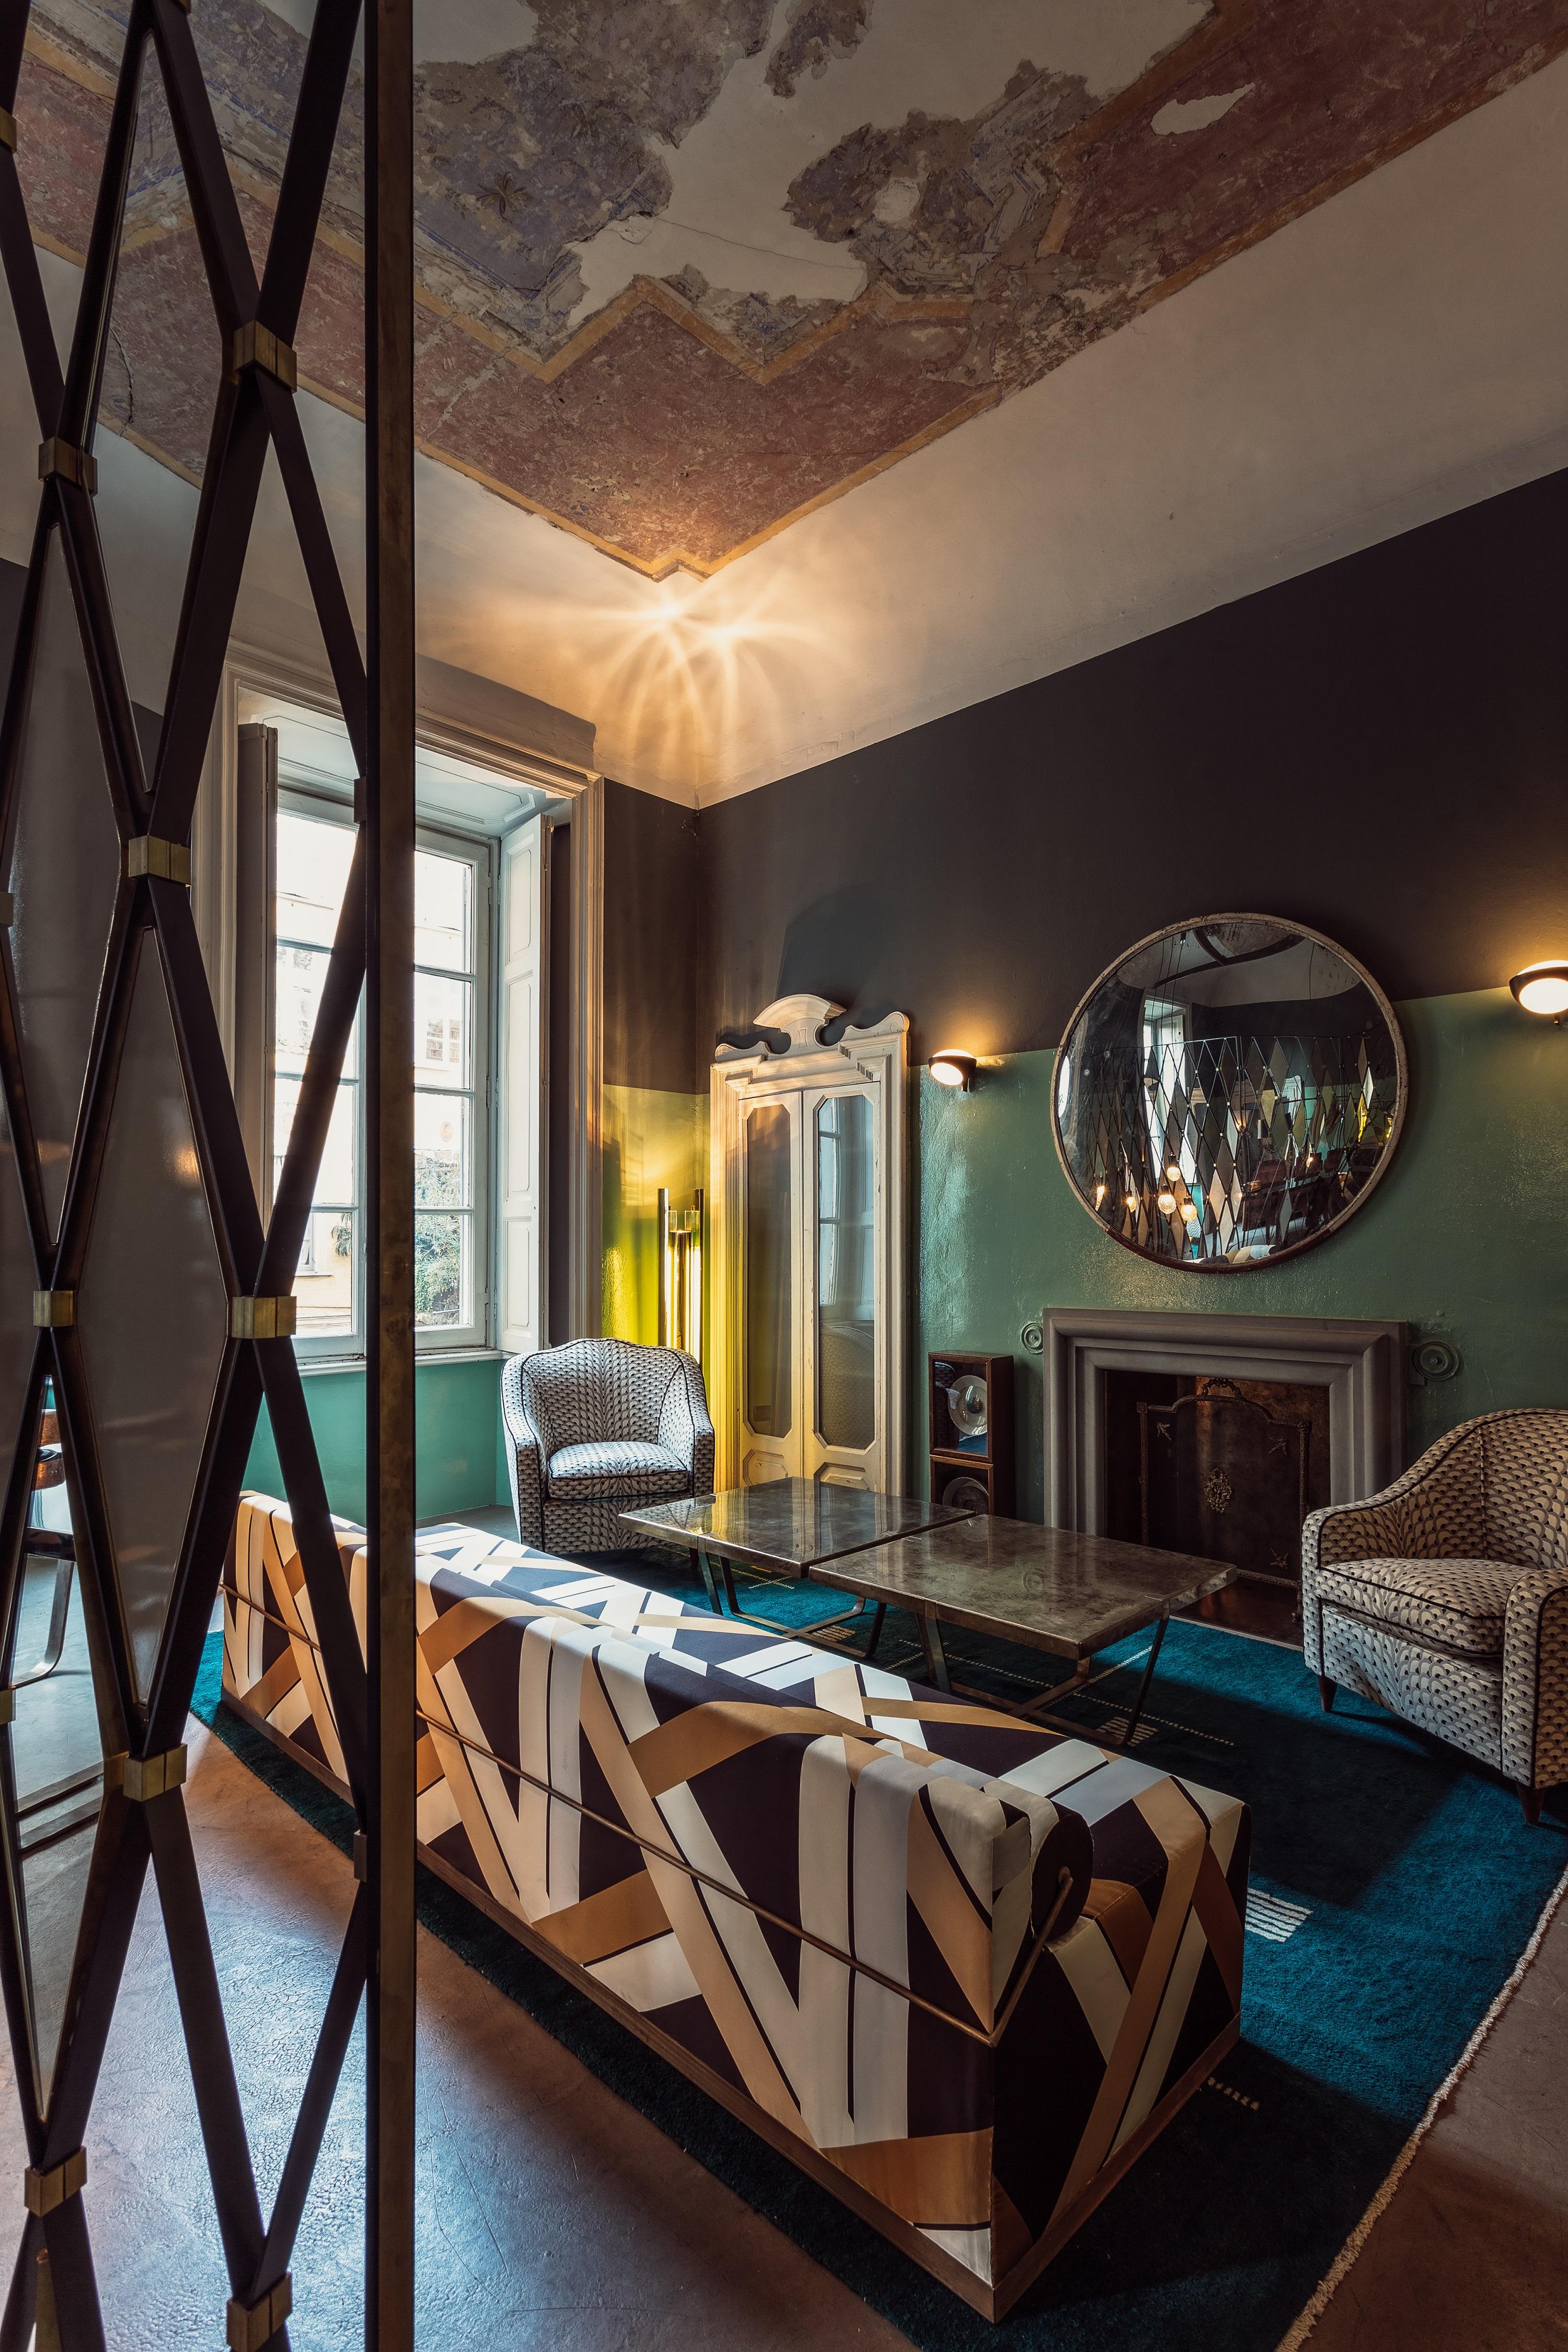 The Salon Art And Design - Nov. 10-14, 2016